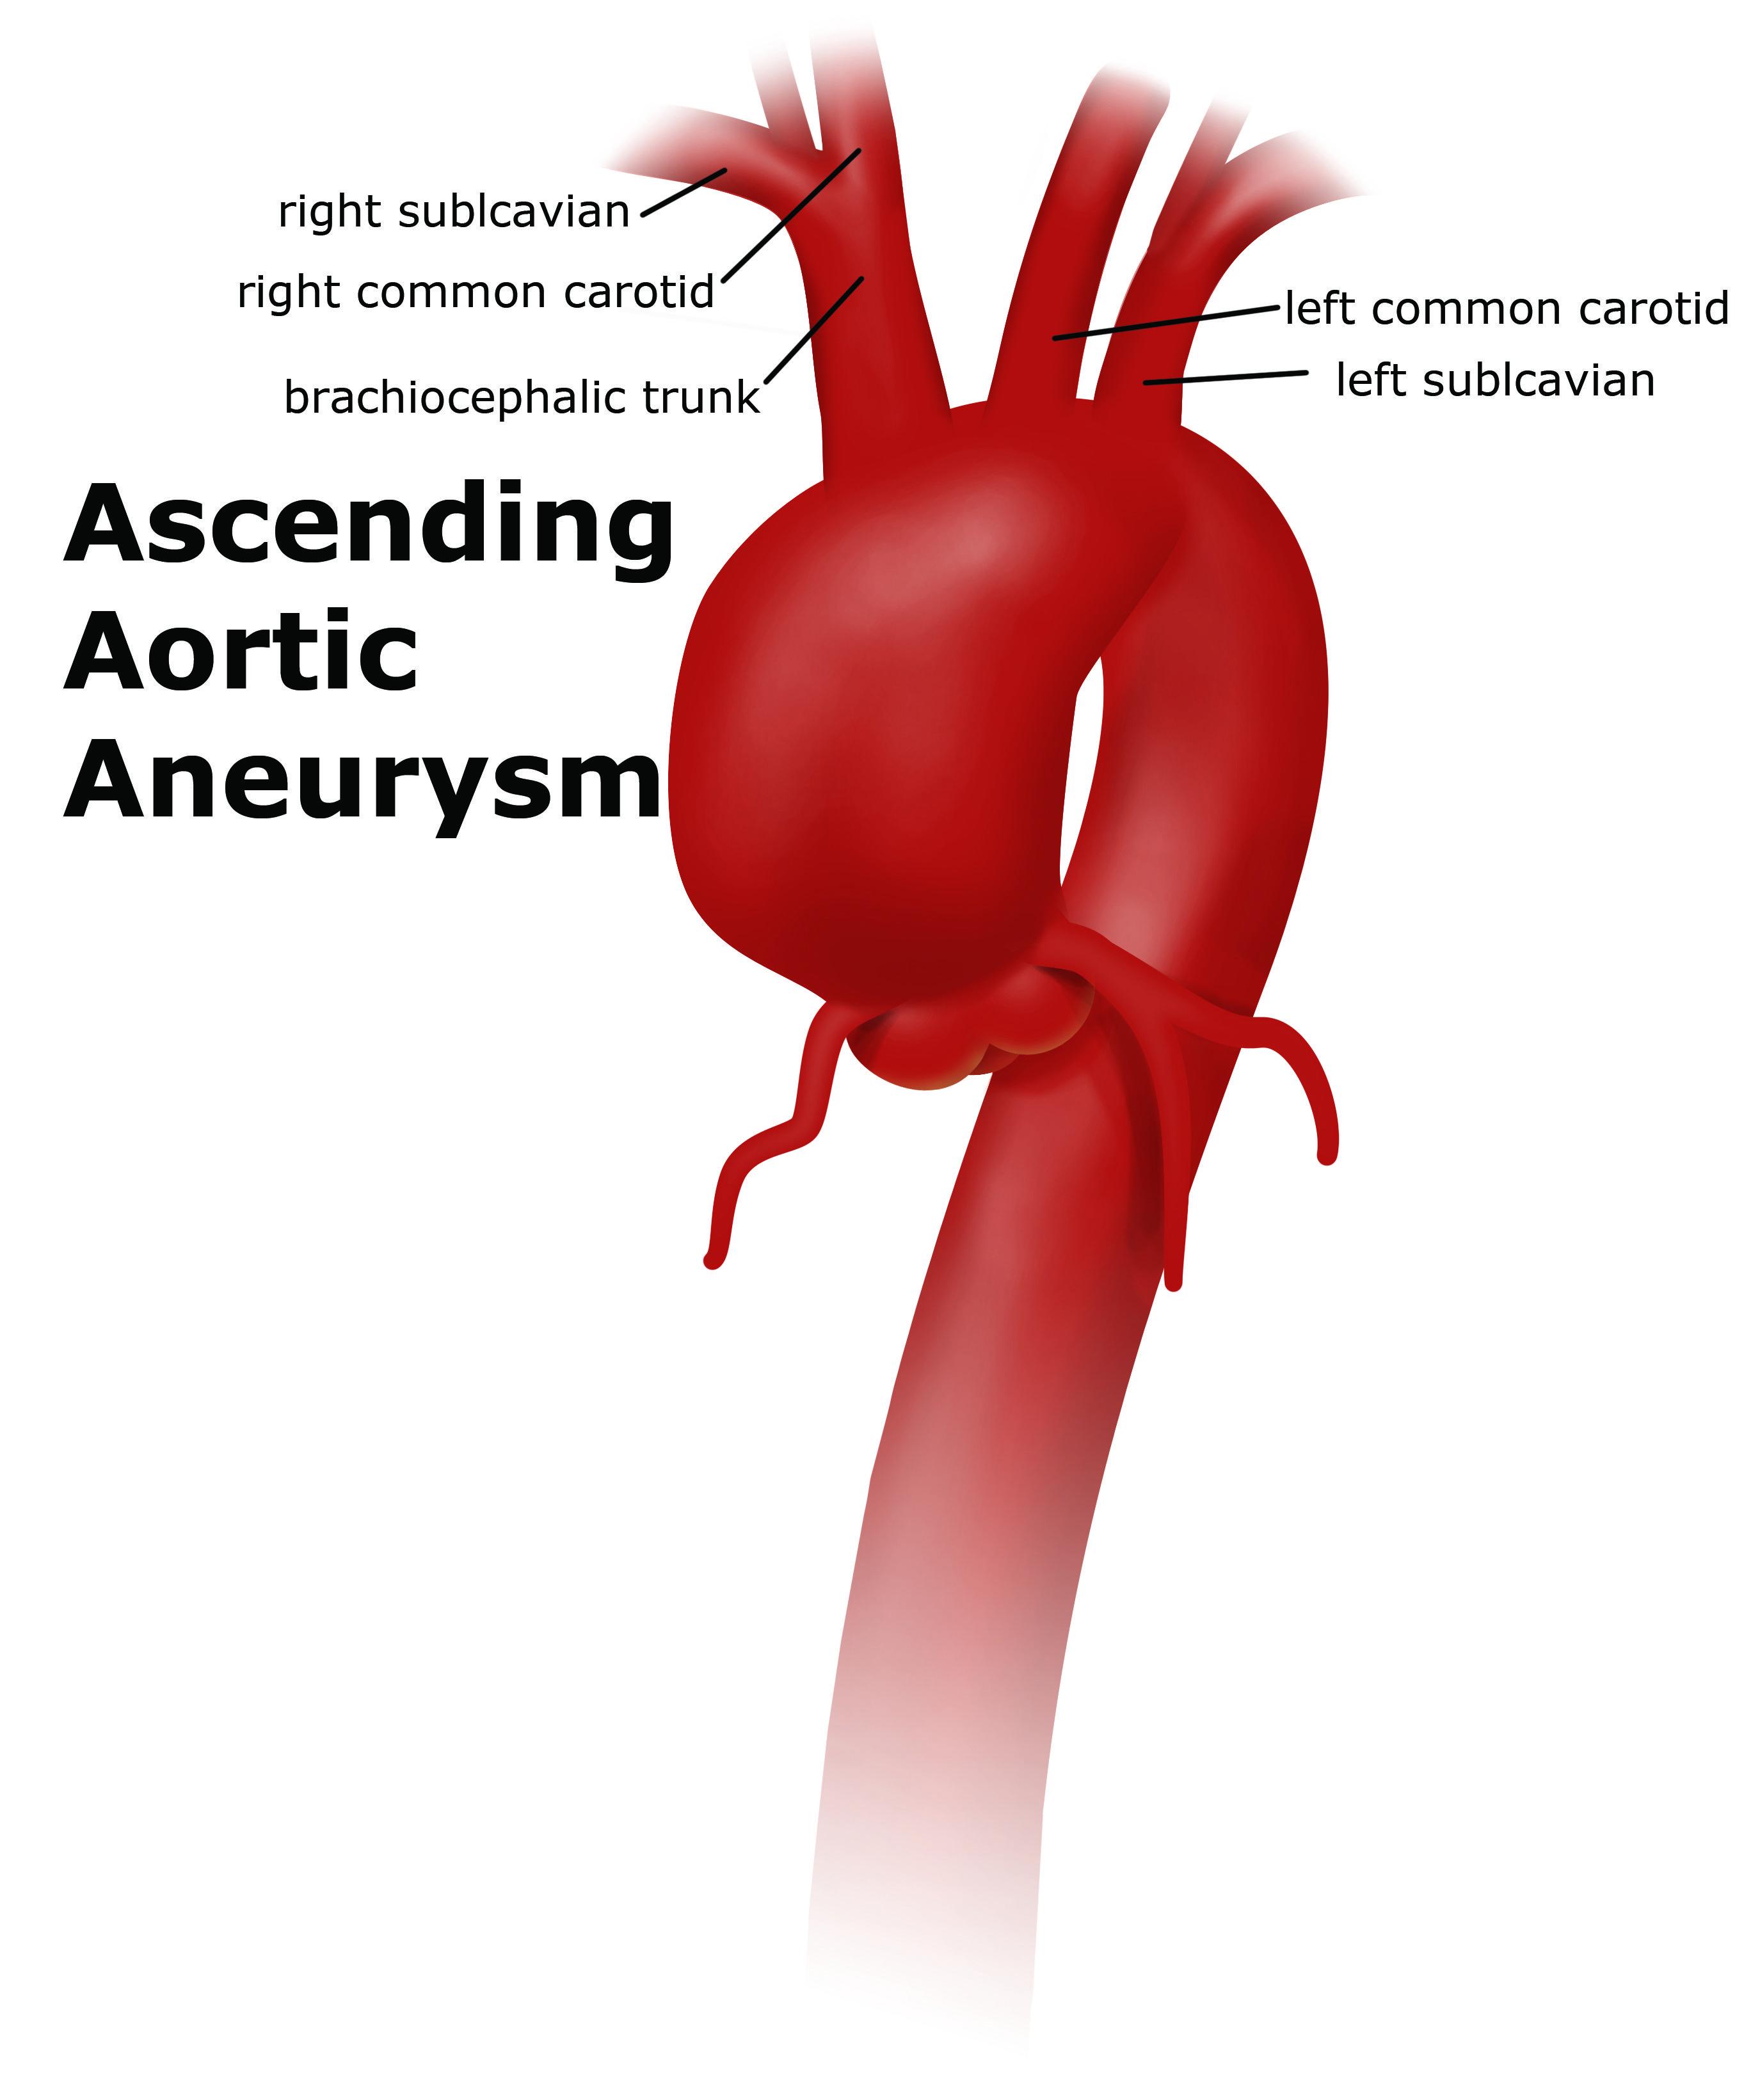 Thoracic Aortic Aneurysm | UF Health Aorta Center|Diseases ...